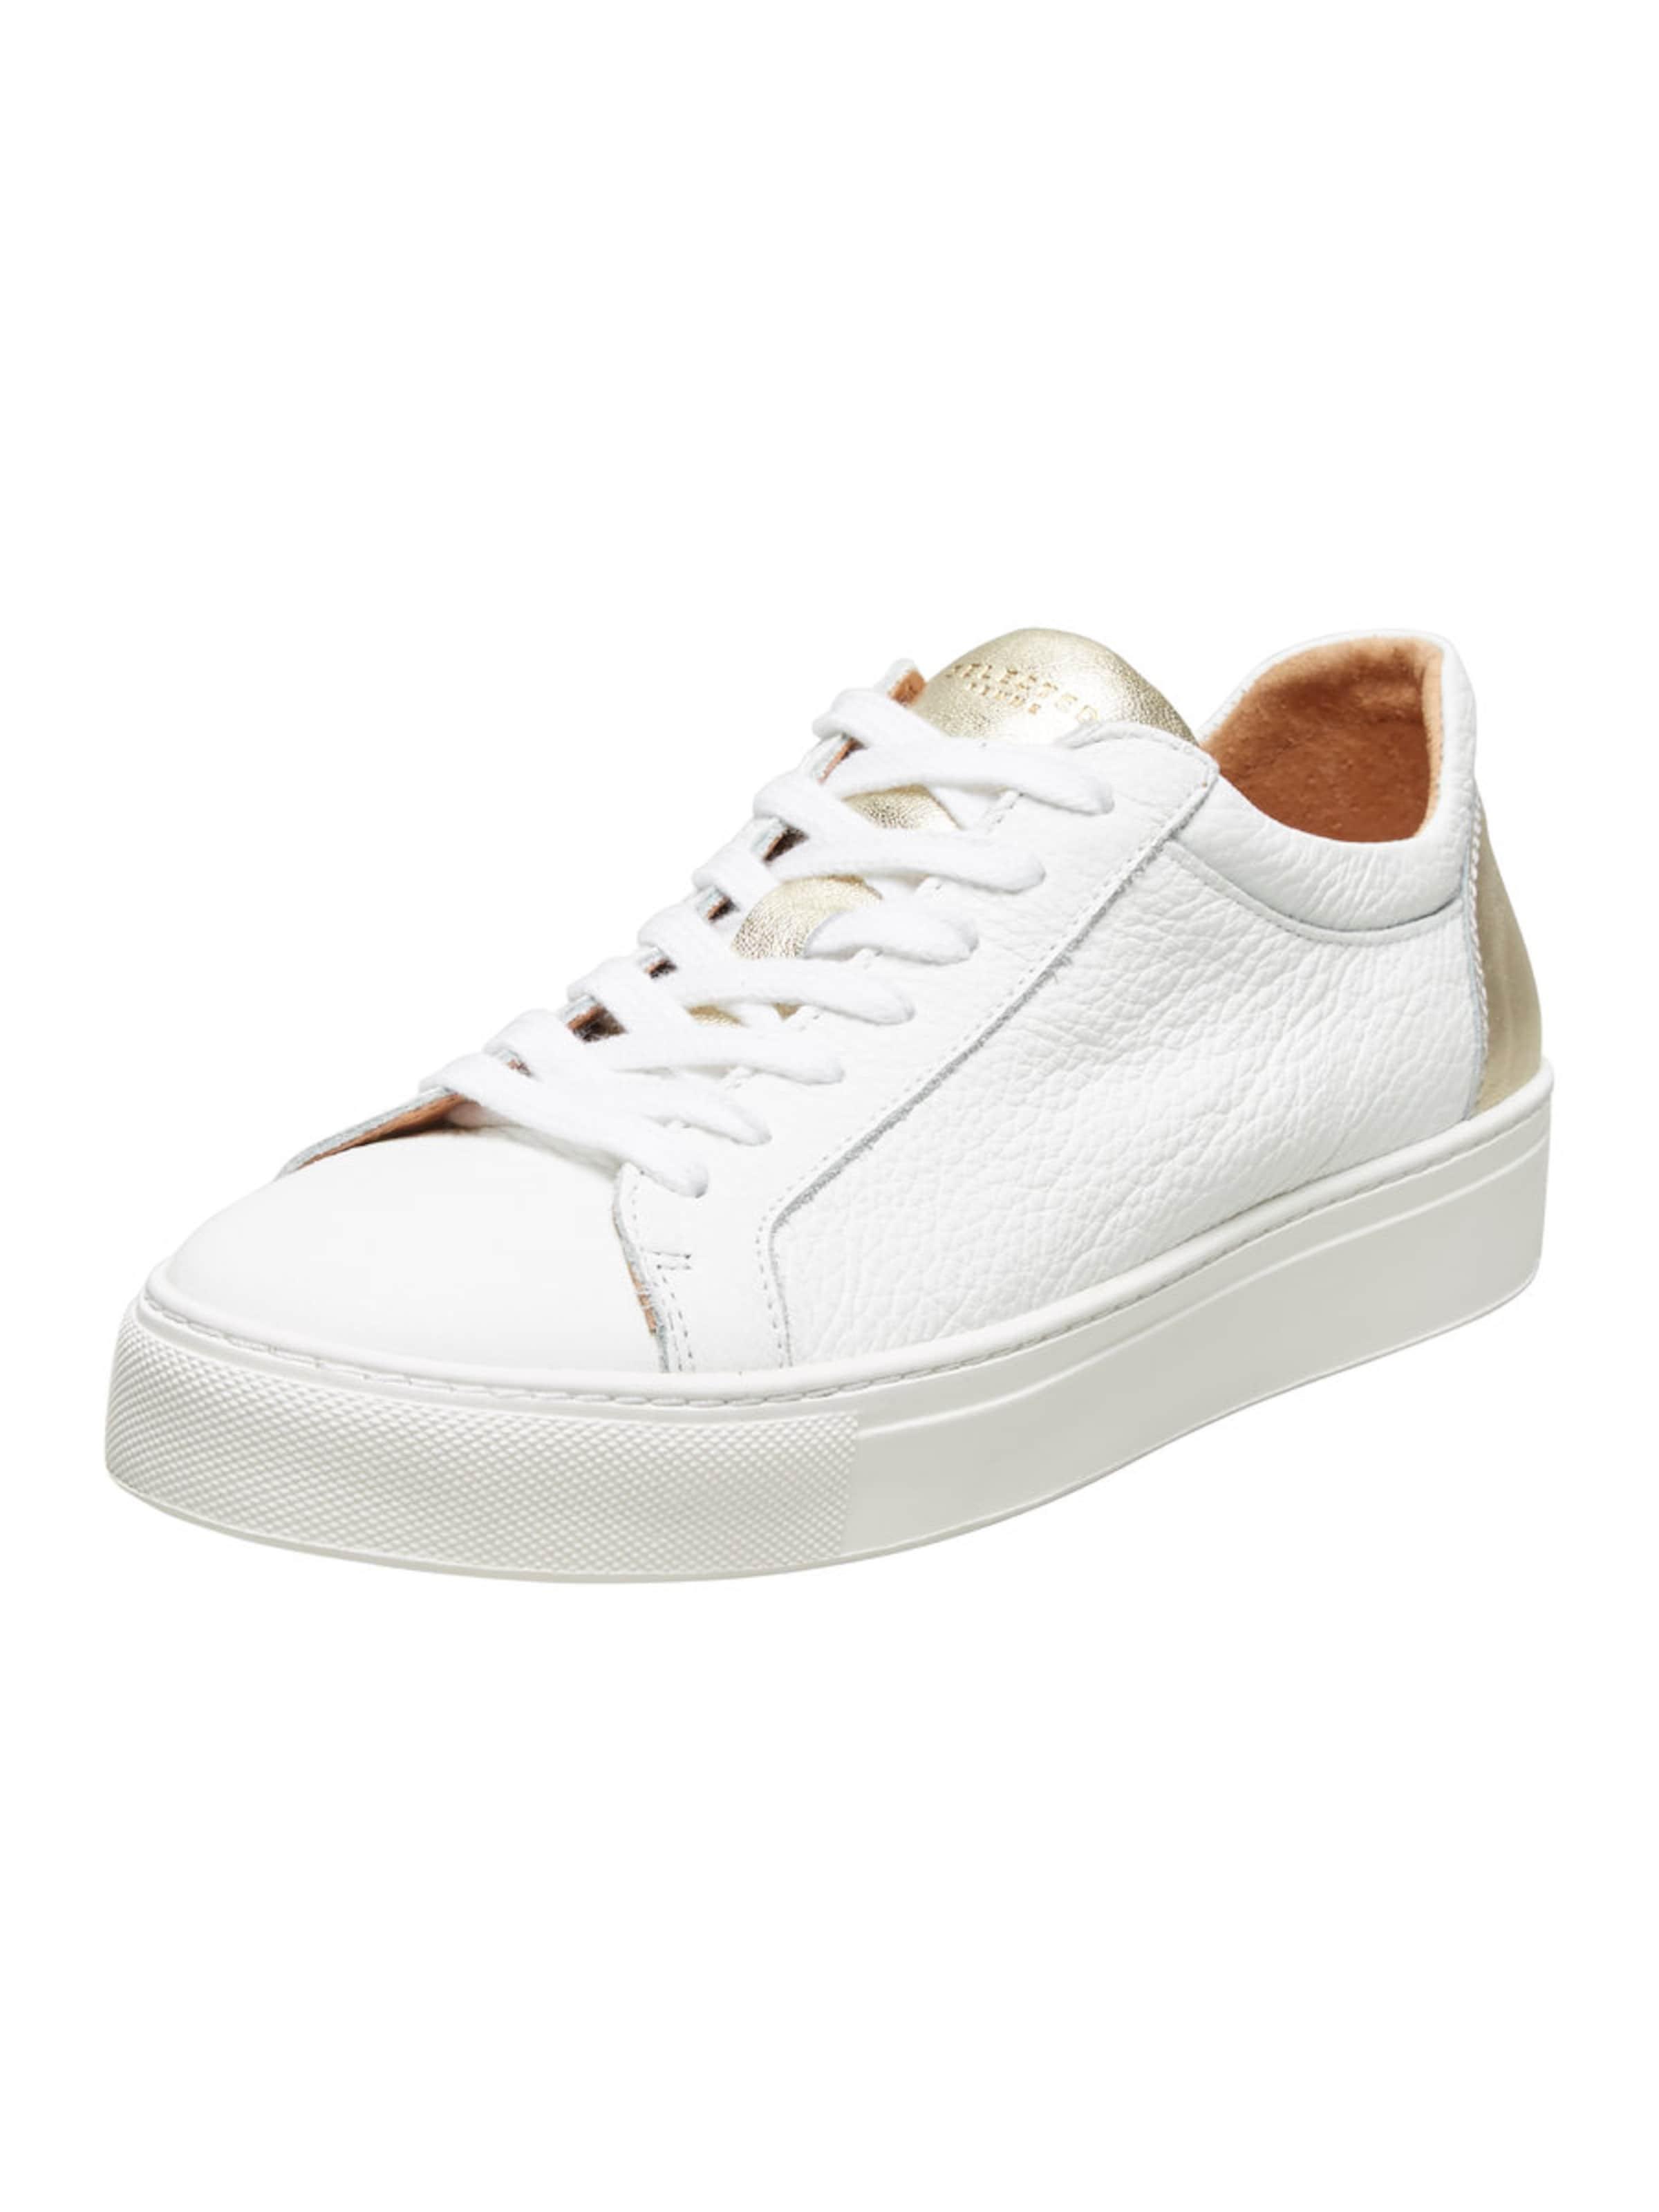 SELECTED FEMME Leder Sneaker Verschleißfeste billige Schuhe